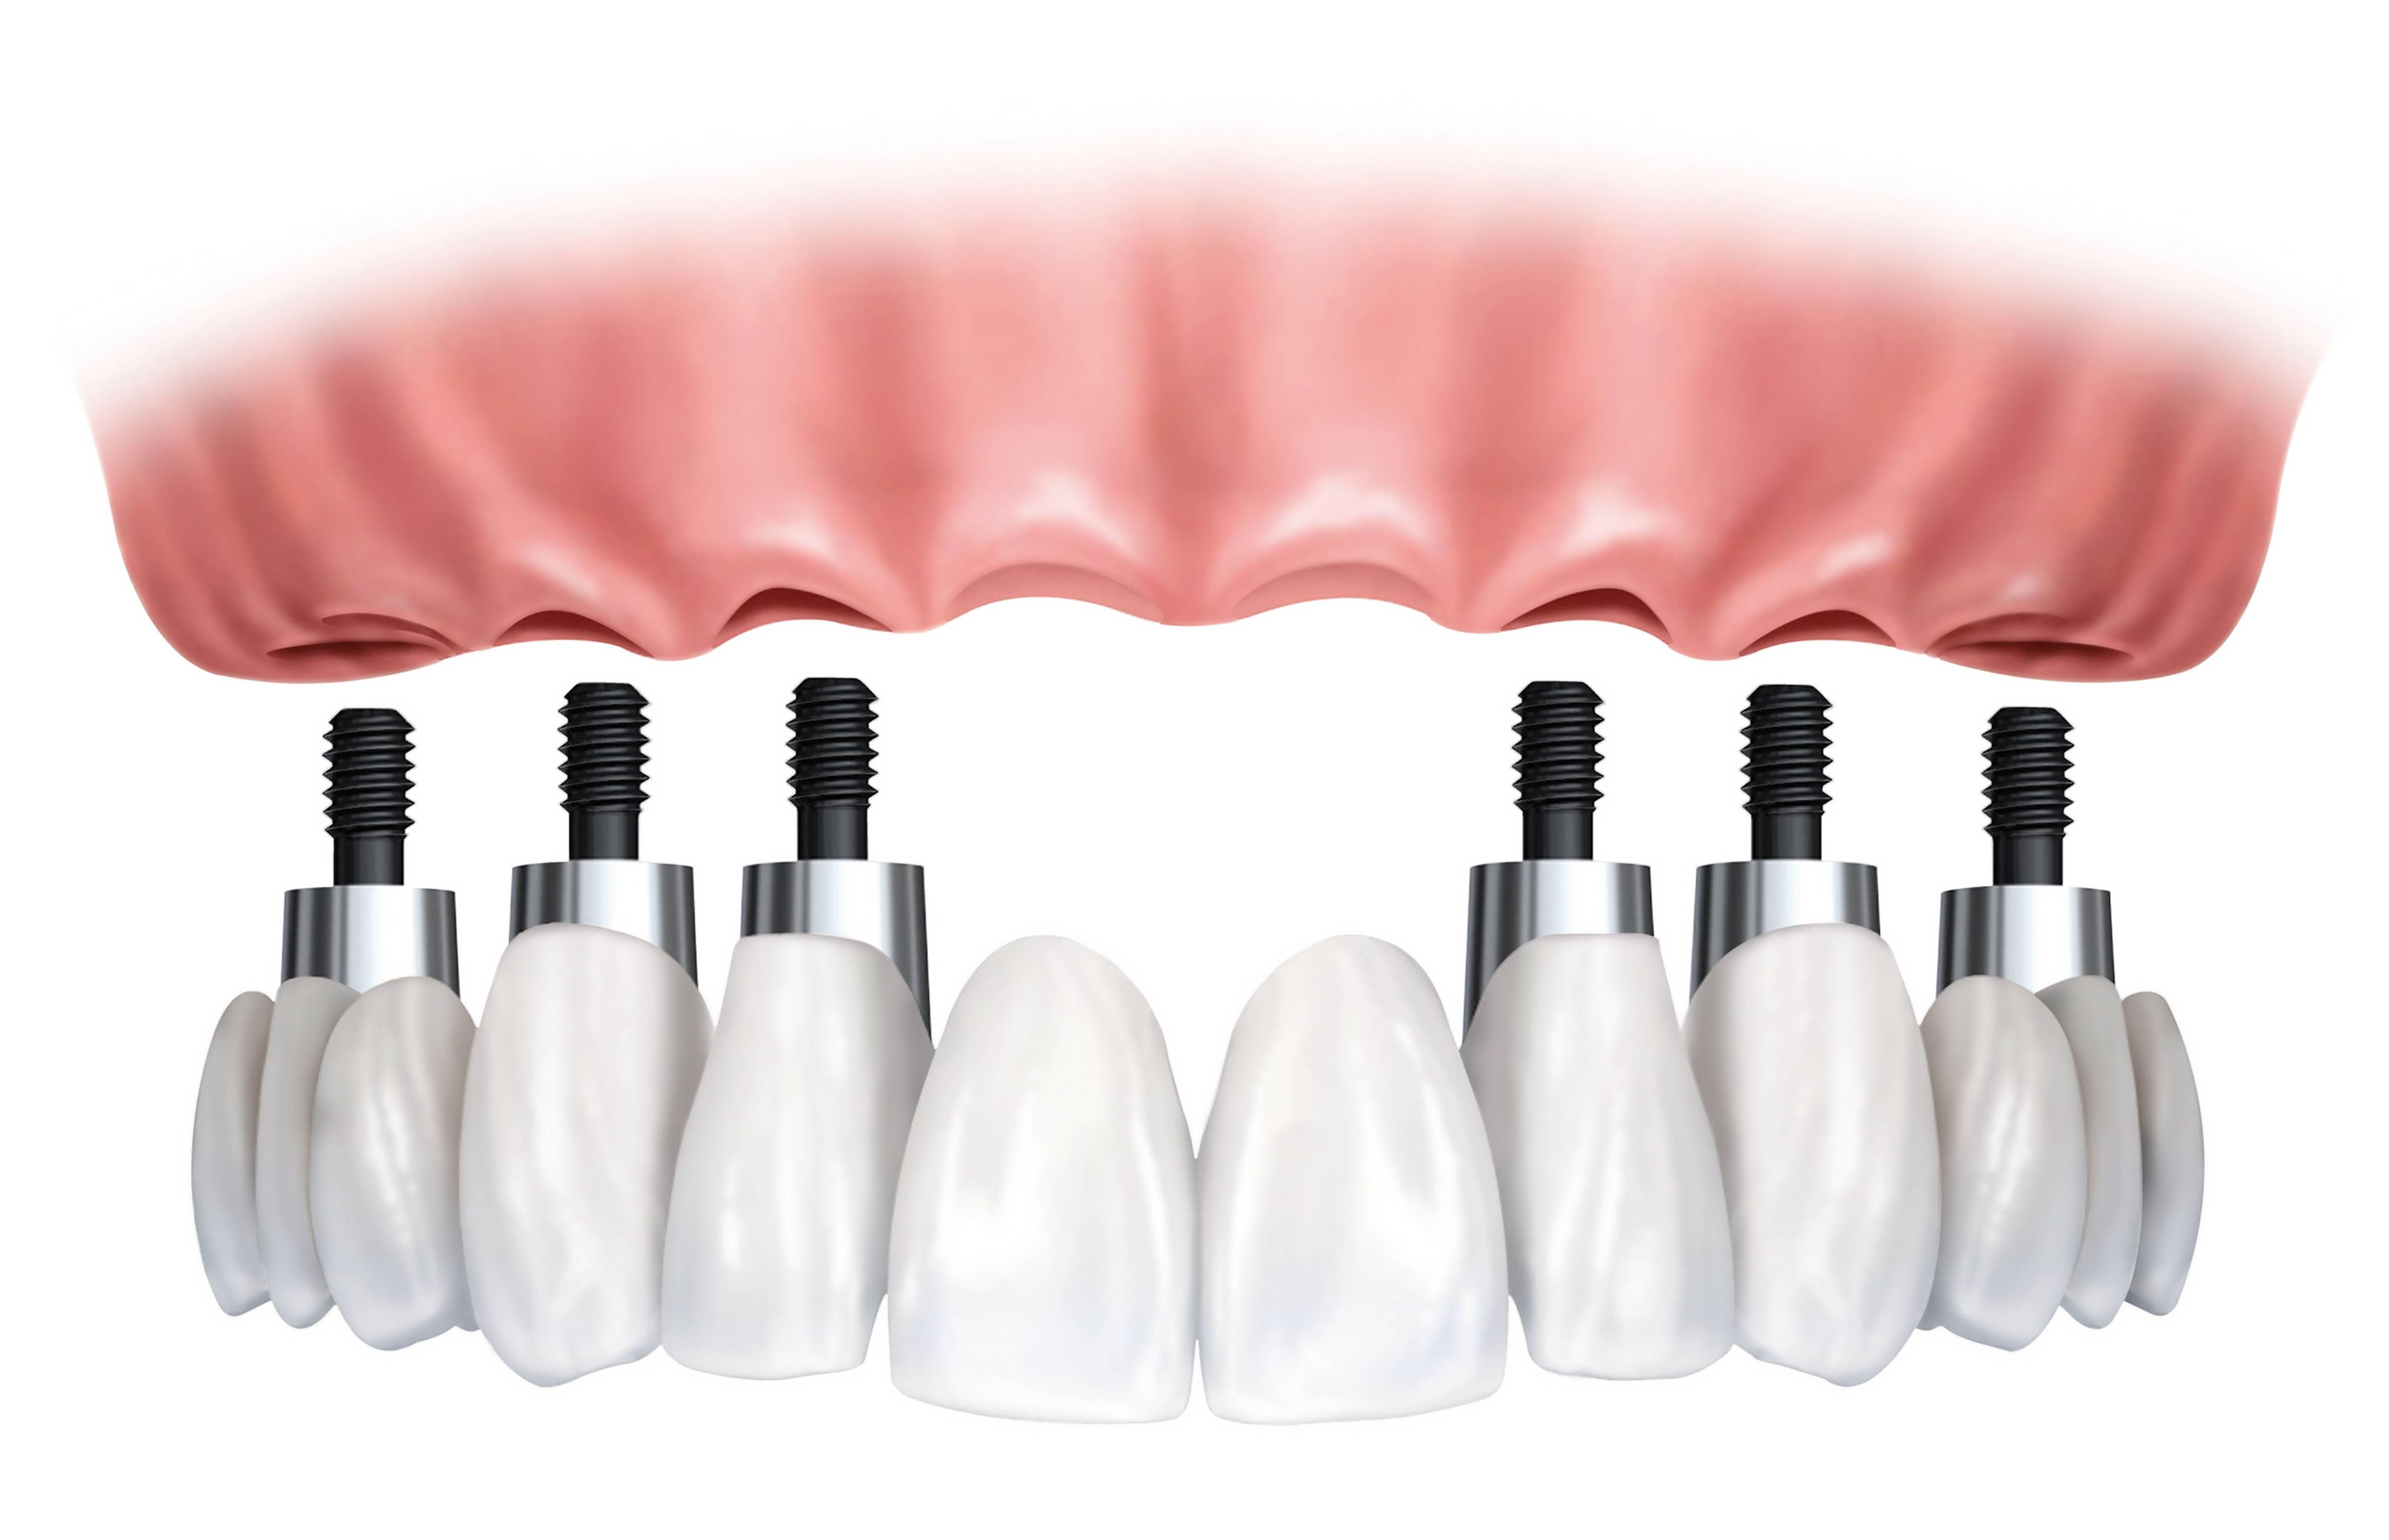 کاشت دندان یا ایمپلنت چیست؟